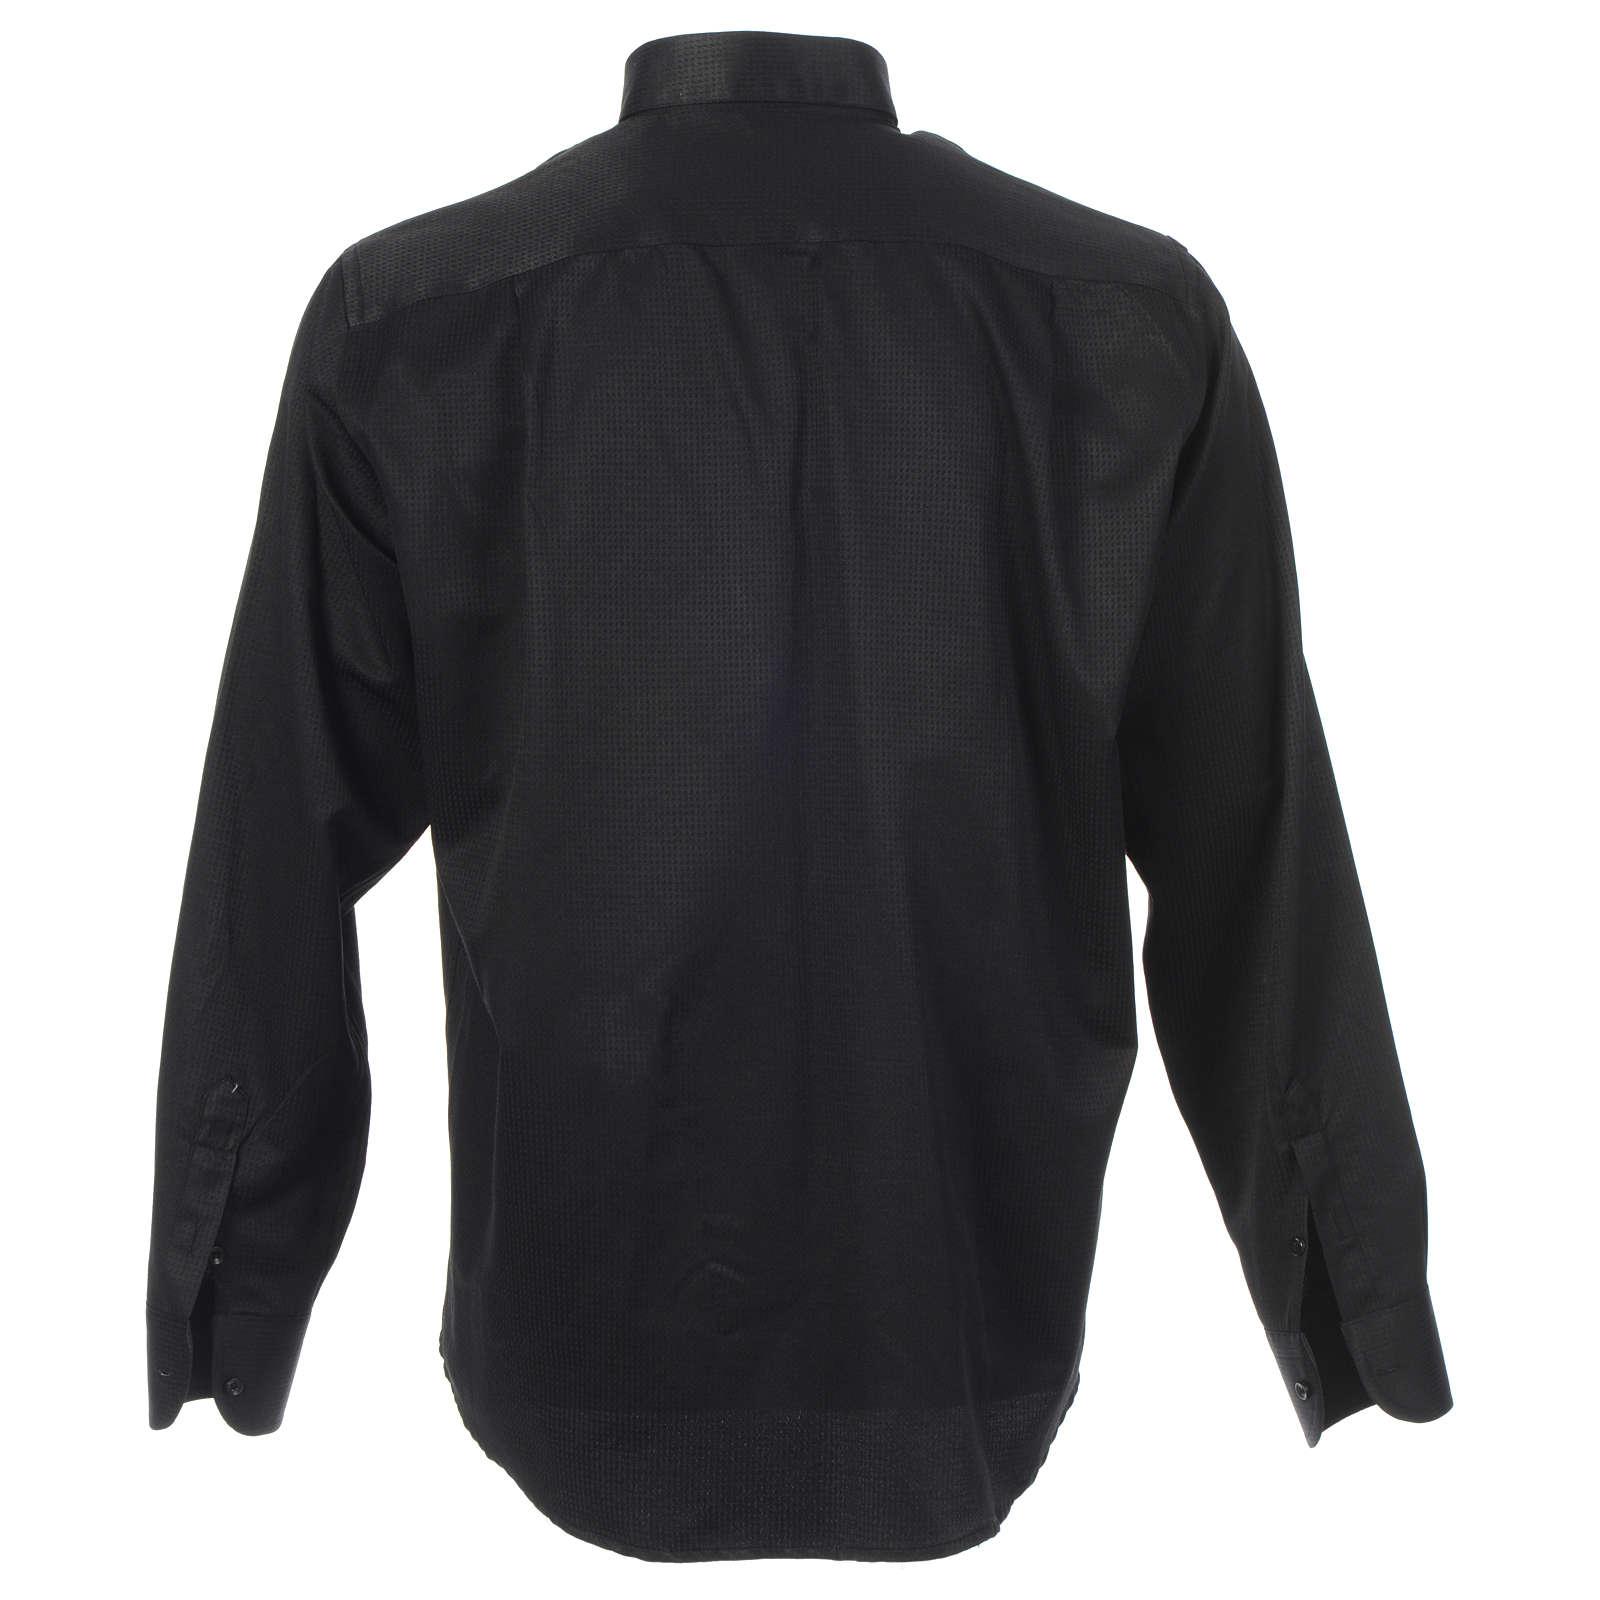 Camisa clergy sacerdote jacquard negro manga larga 4